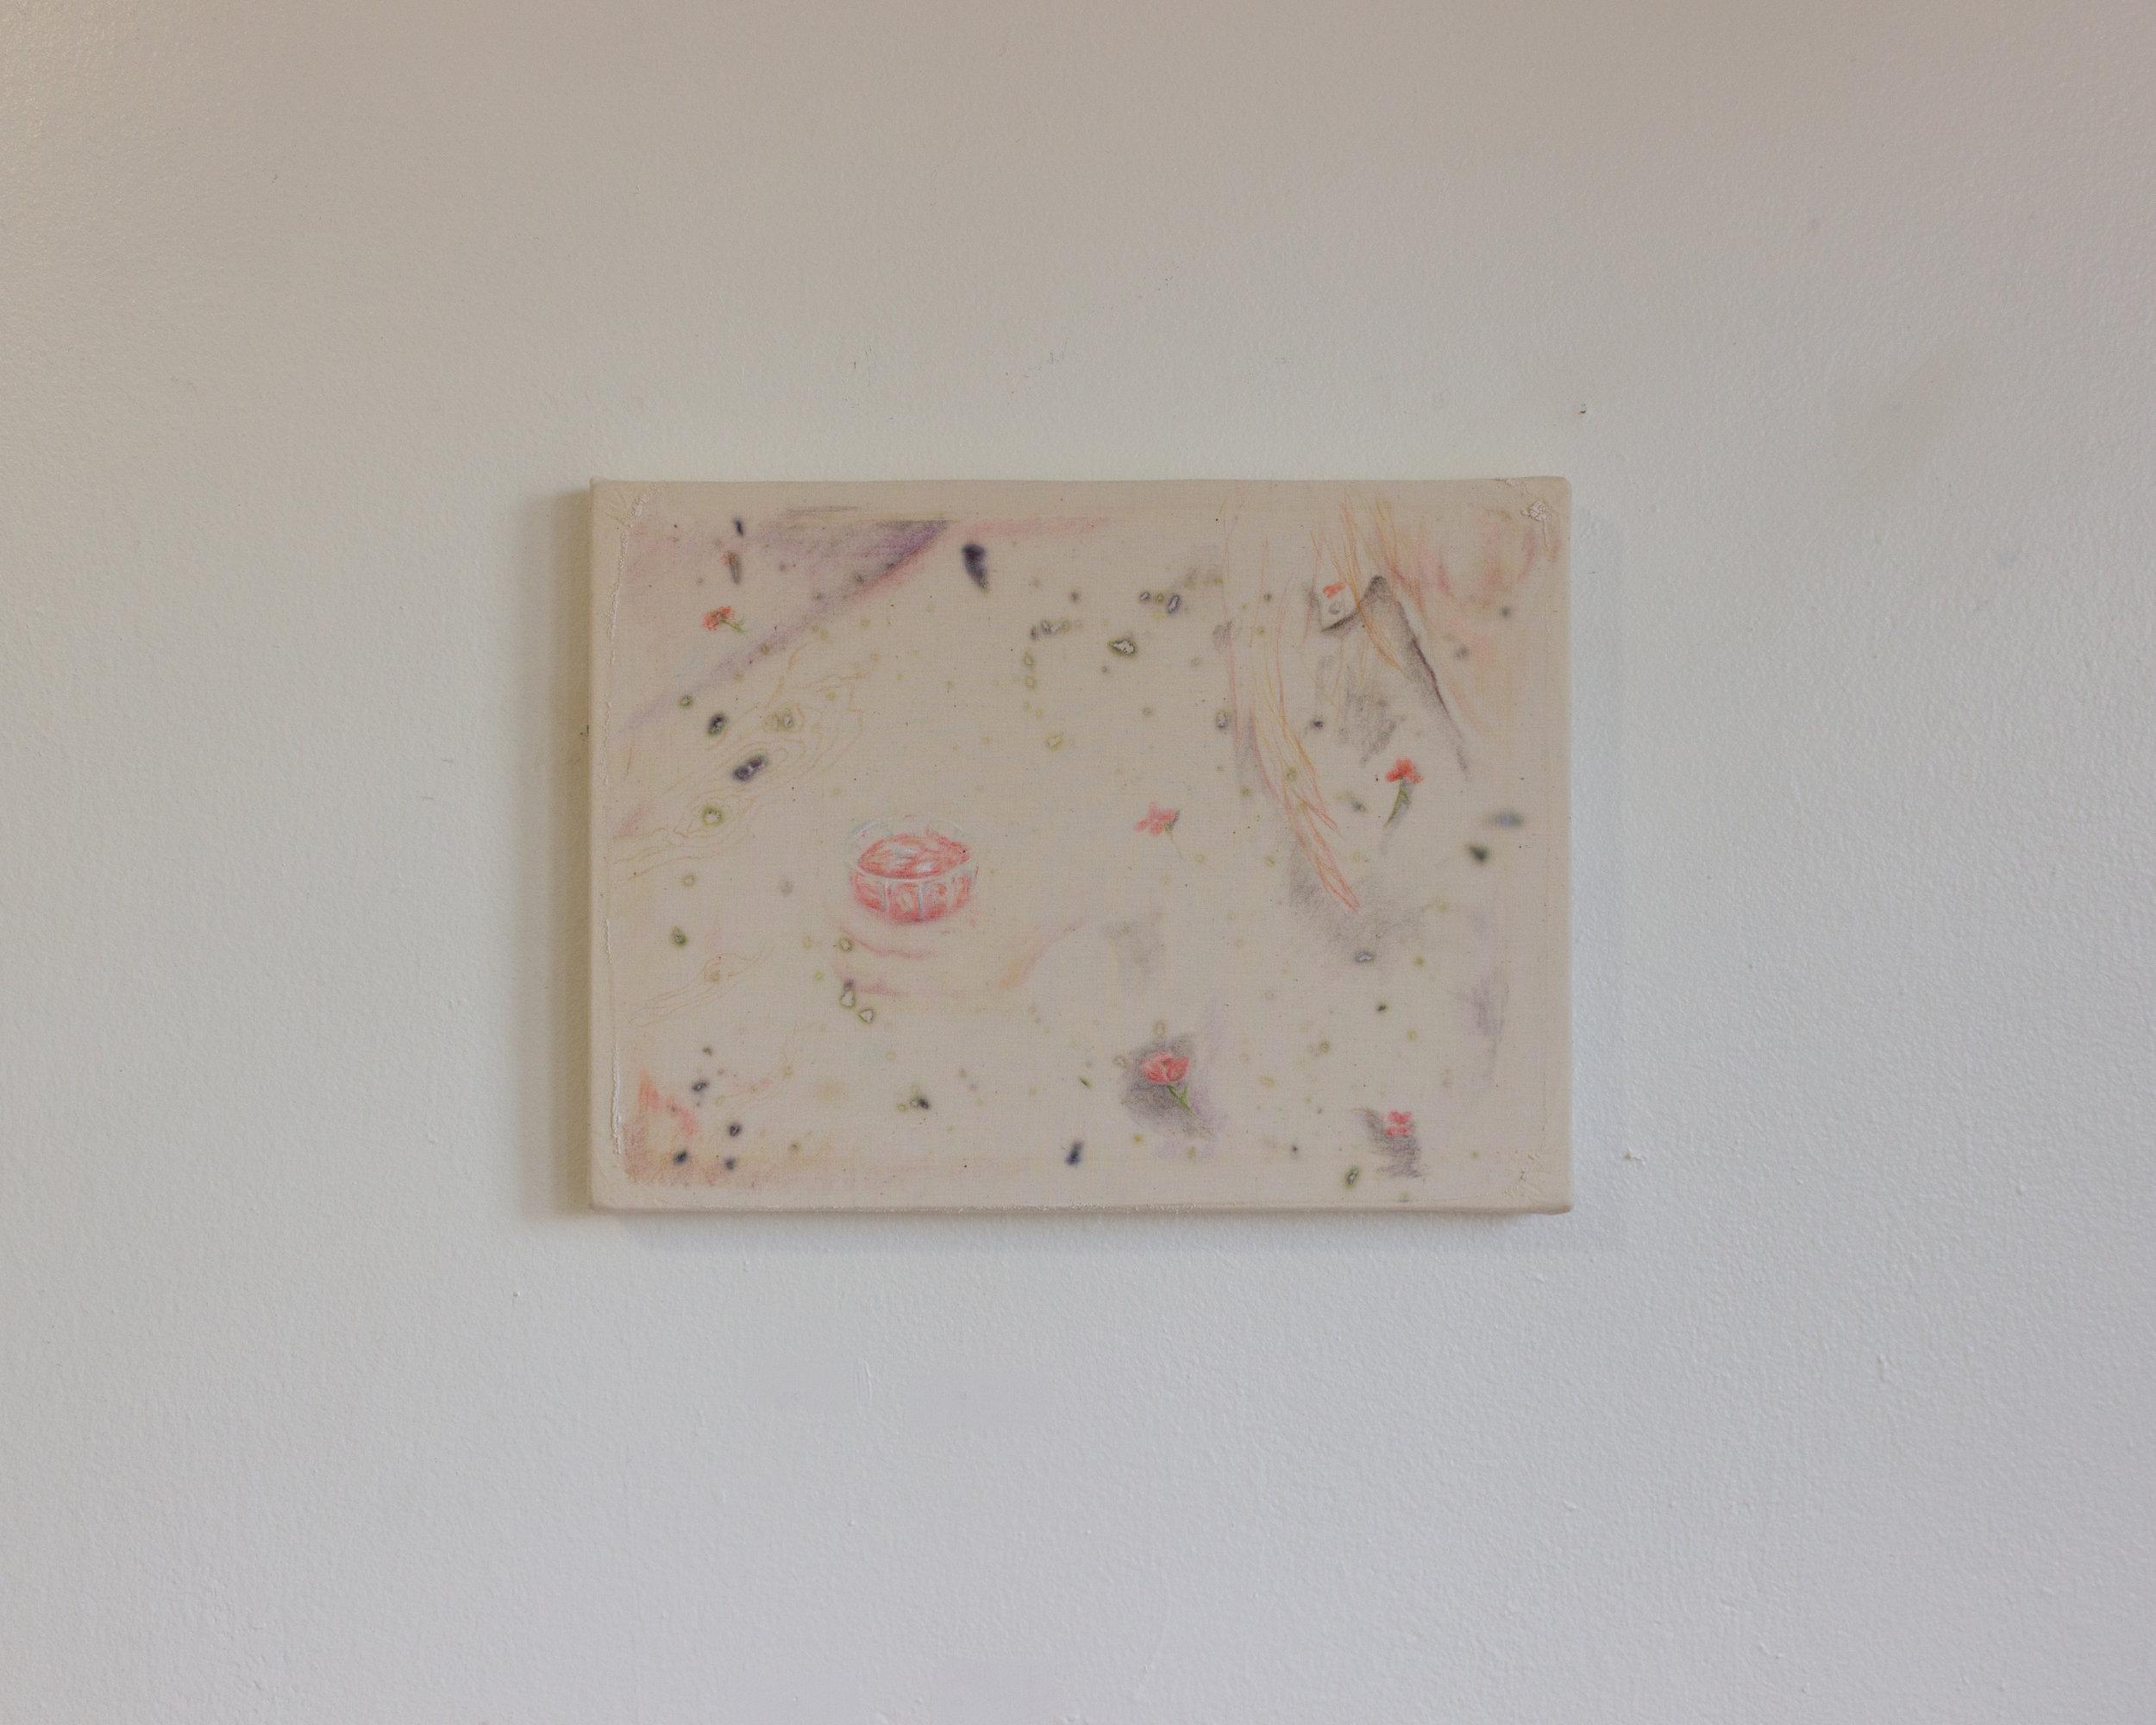 Alejandro Jiménez-Flores,  una noche maravillosa —a wonderful night , 2019, soft-pastels, flower petals dyes, and plaster on muslin, 9x11 in.